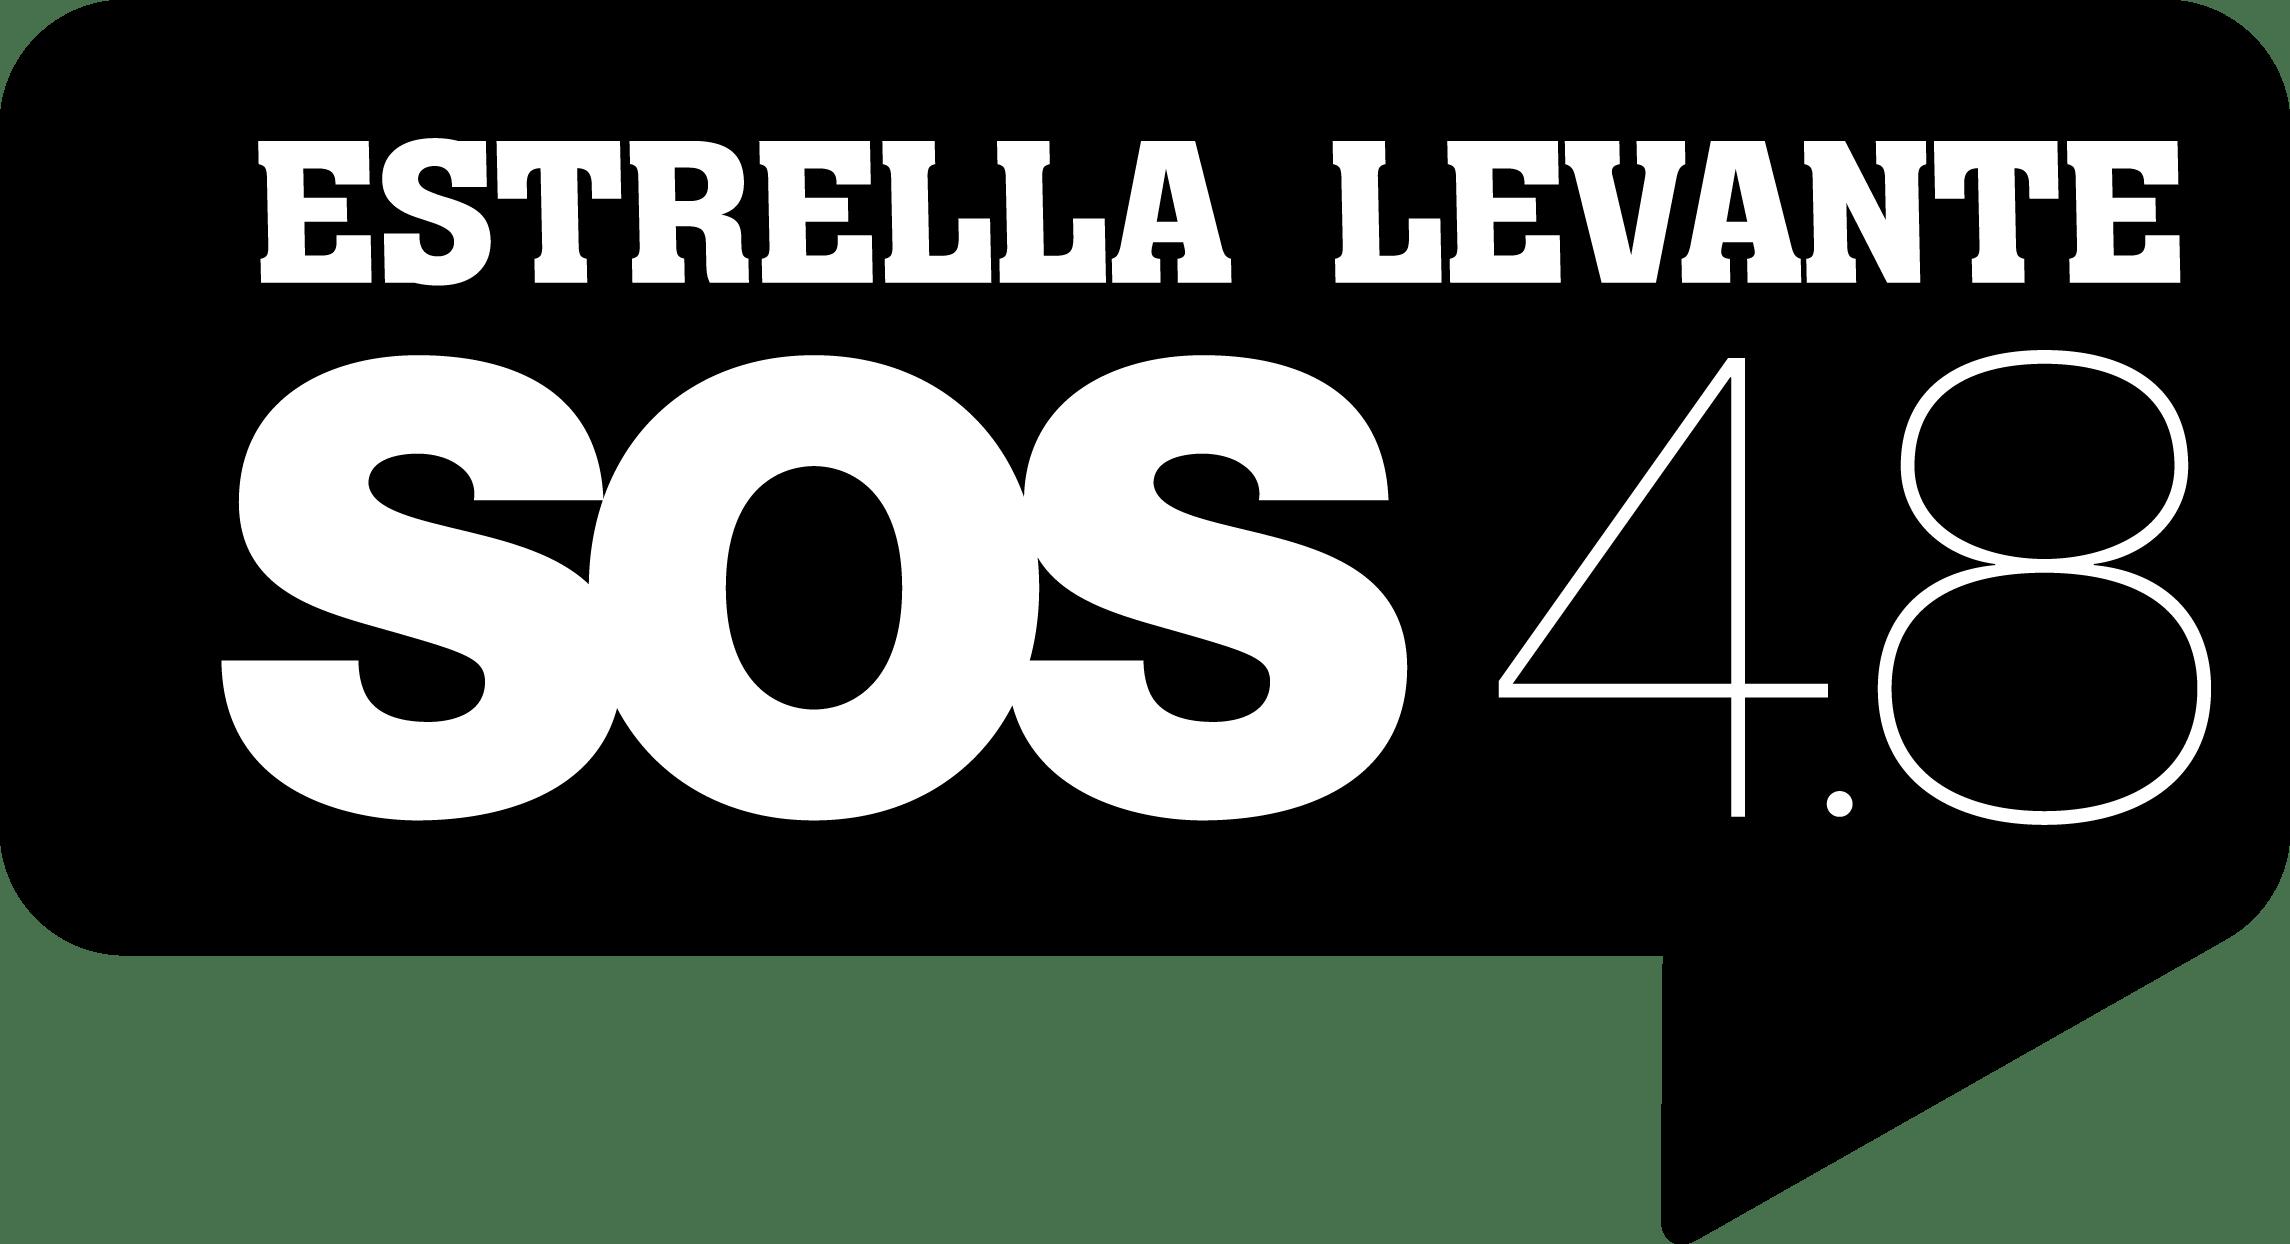 Estrella+Levante+SOS48+LOGO